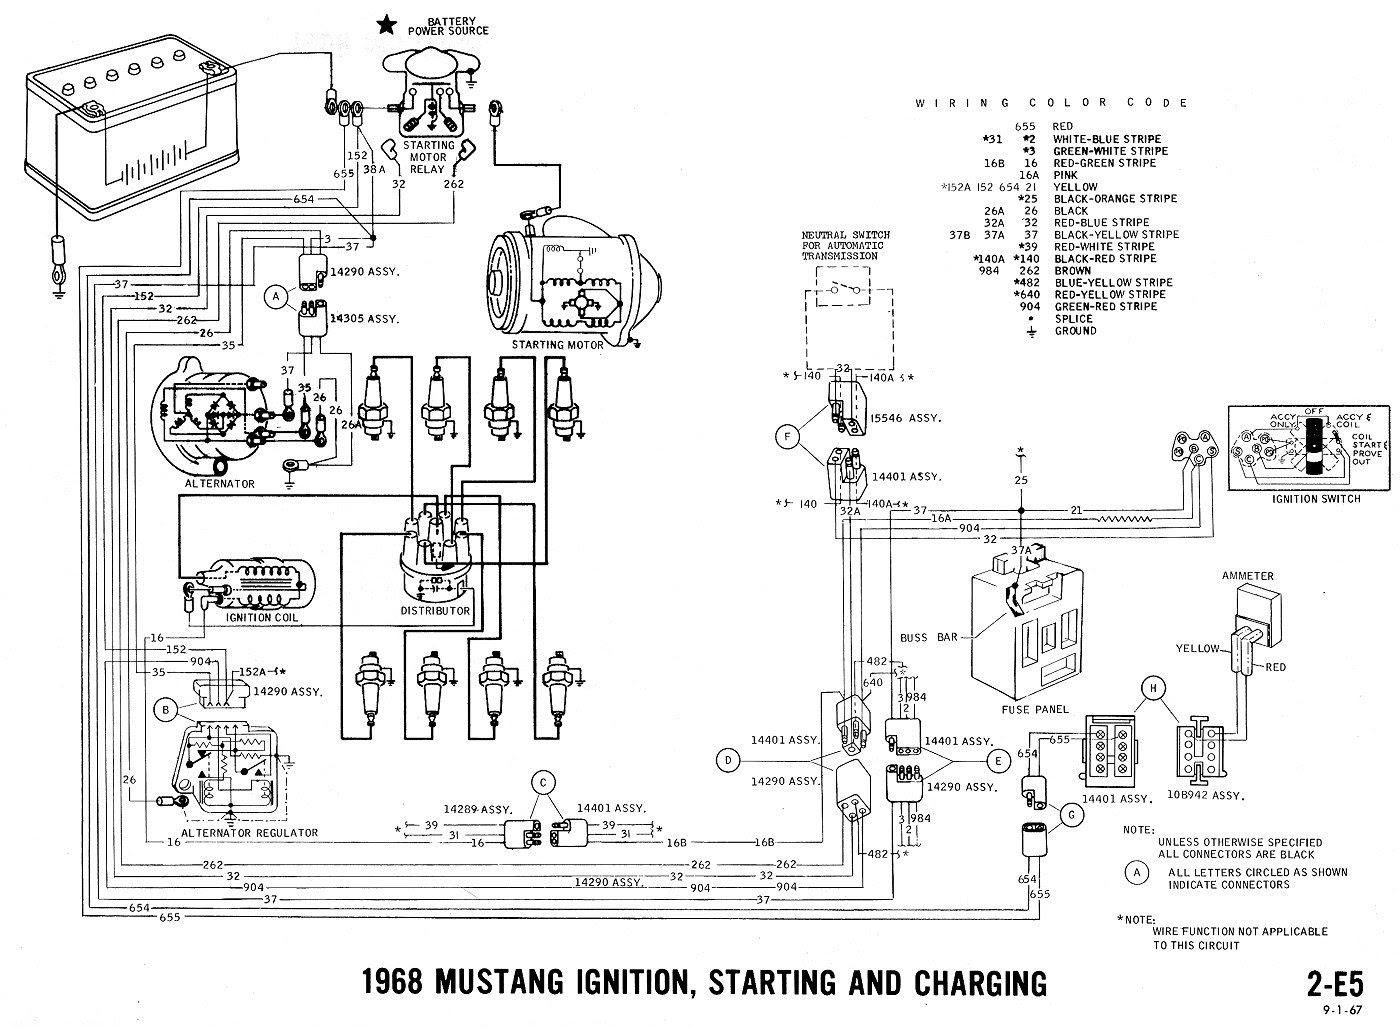 Amp Meter Wiring Diagram 1966 Mustang 1976 Mg Wiring Diagram Bege Wiring Diagram